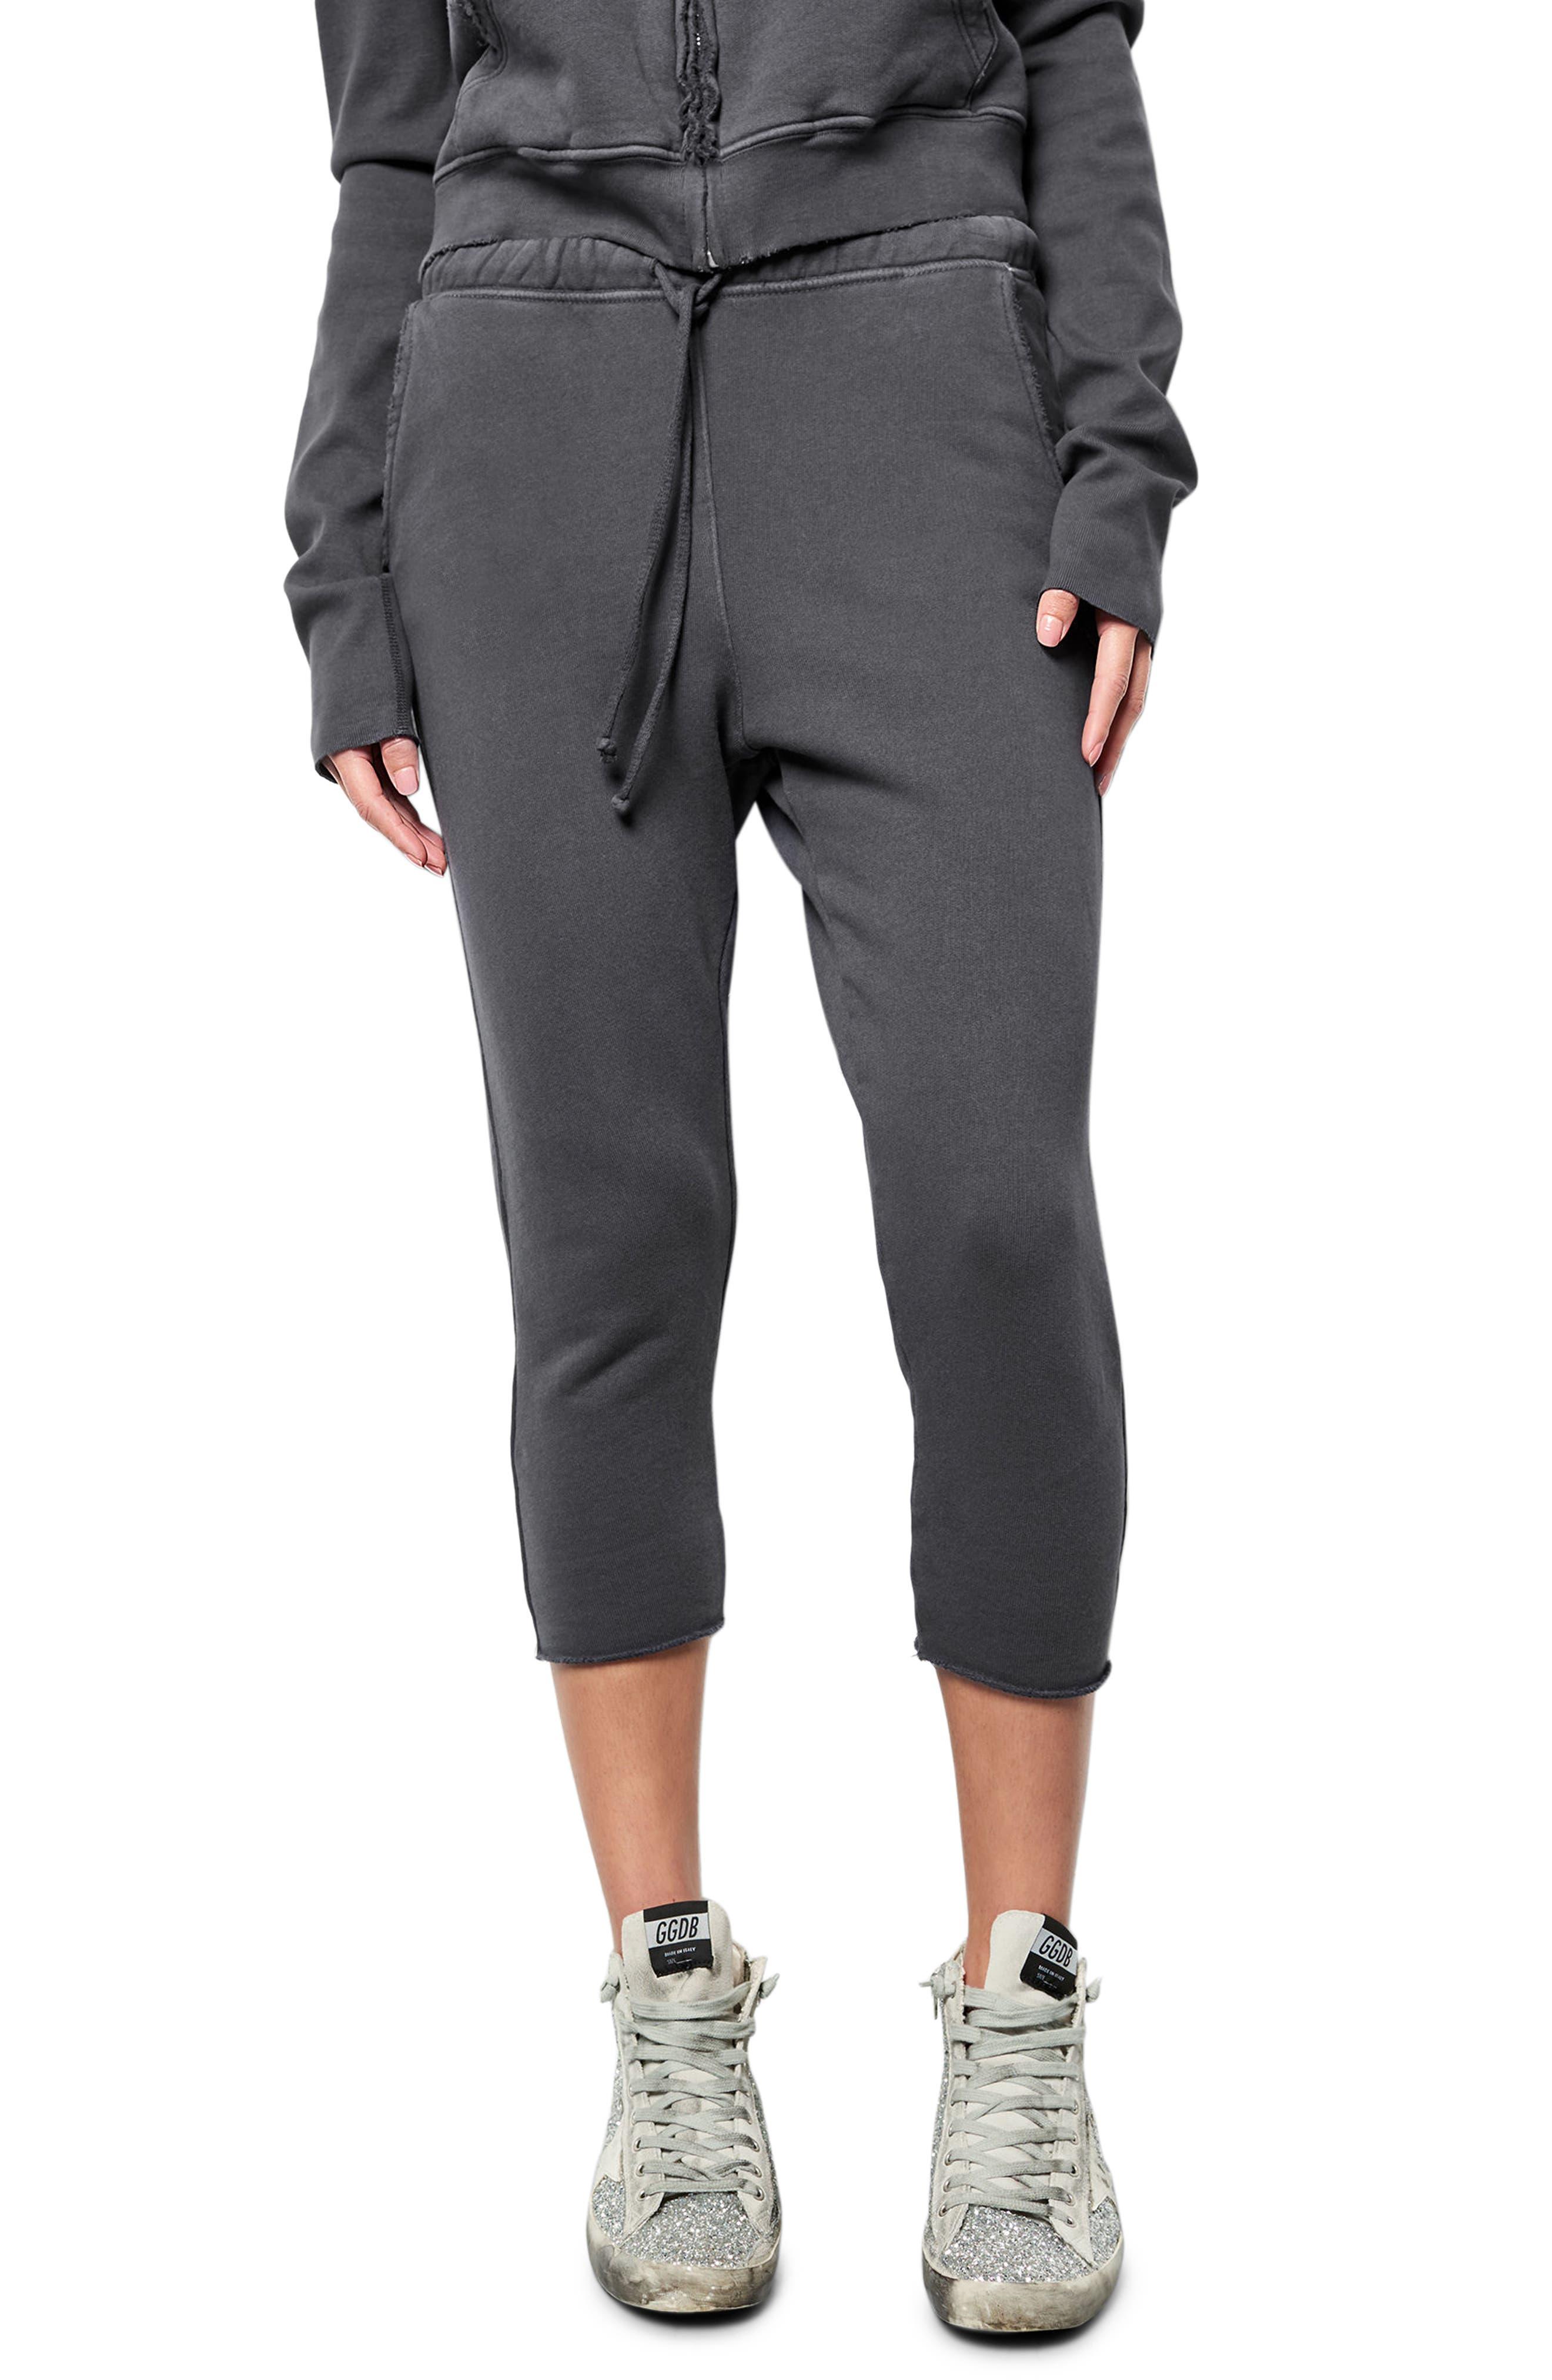 Raw Hem Crop Sweatpants,                             Main thumbnail 1, color,                             010